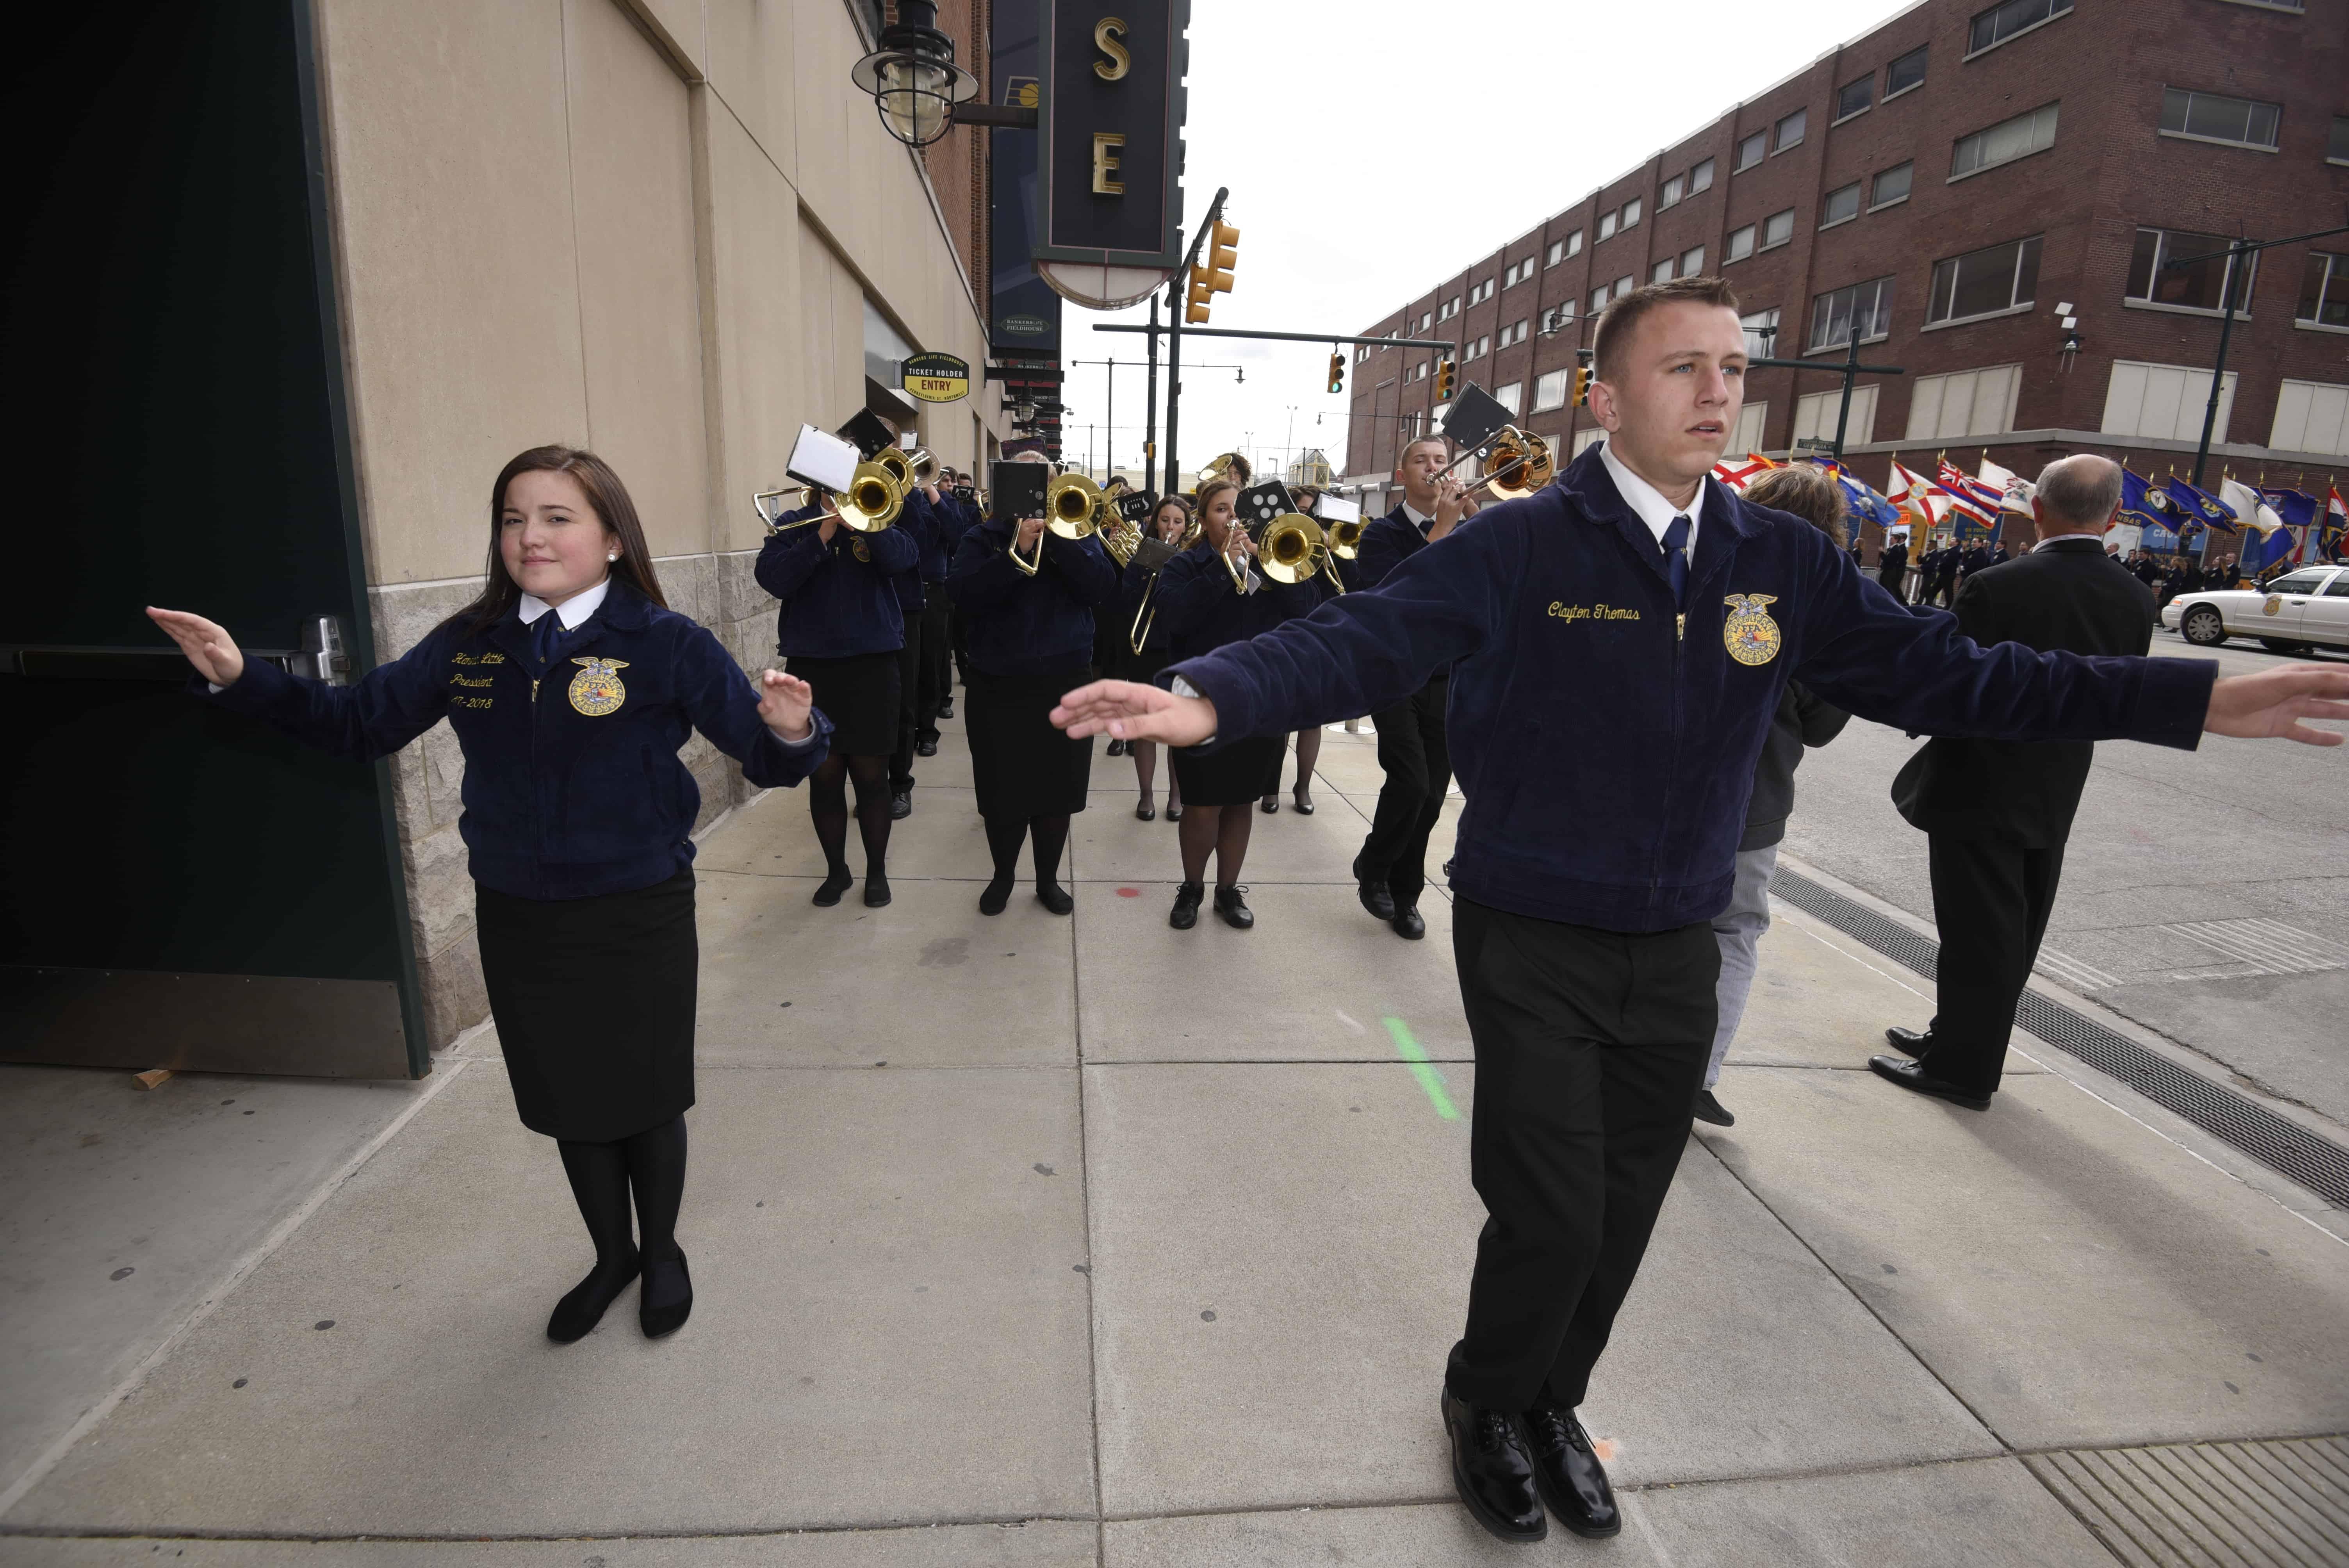 Band Drum Major Attends Convention, Despite Loss